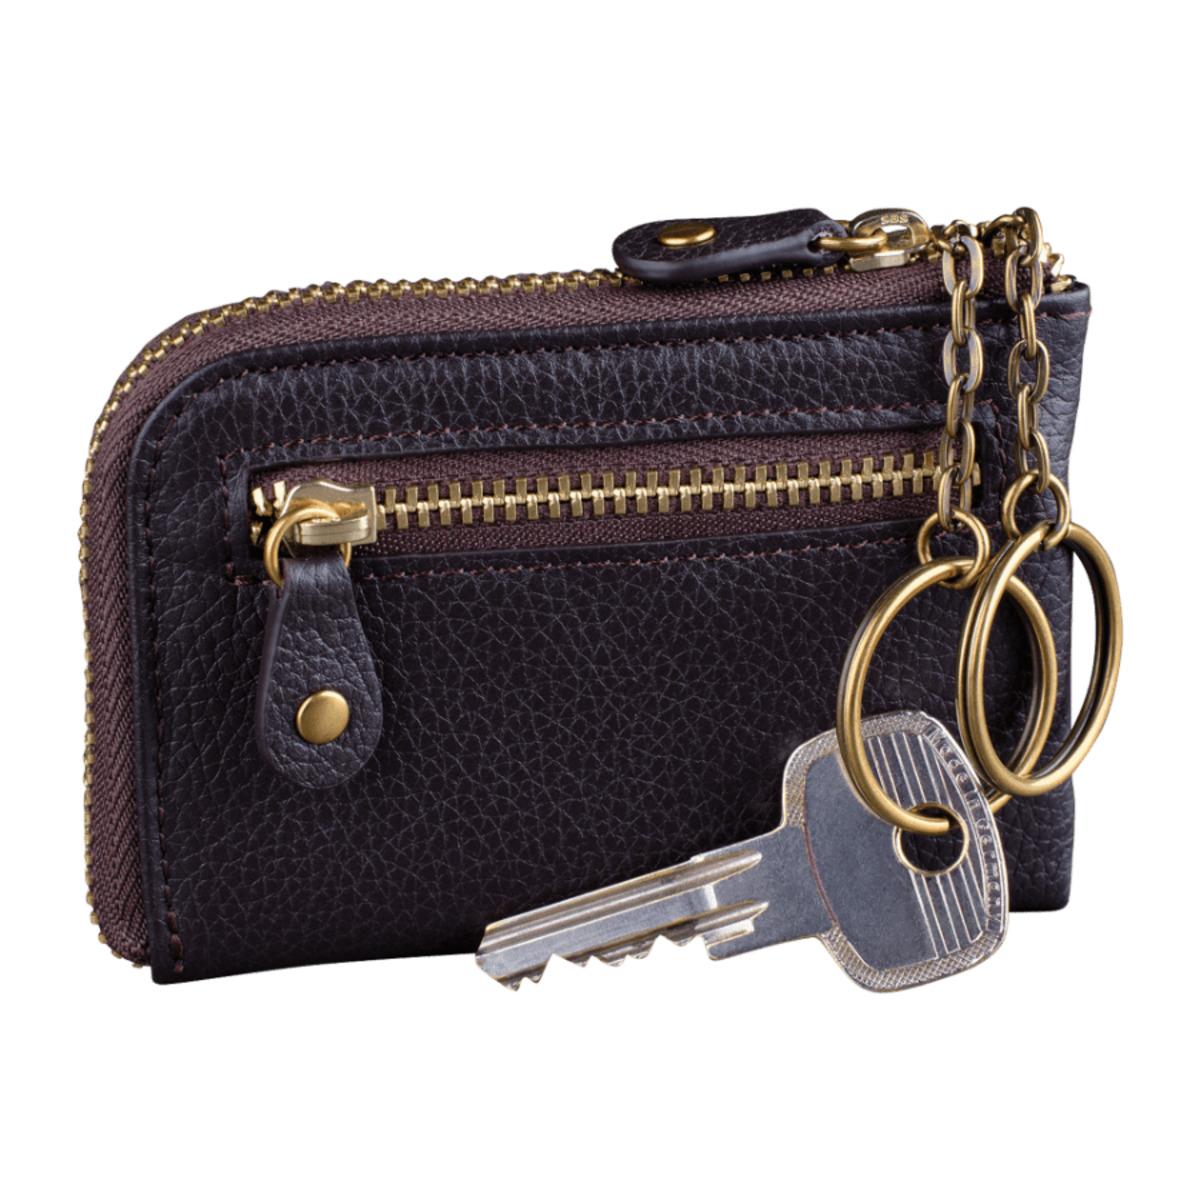 Bild 5 von ROYAL LIFE     Leder-Schlüsseletui